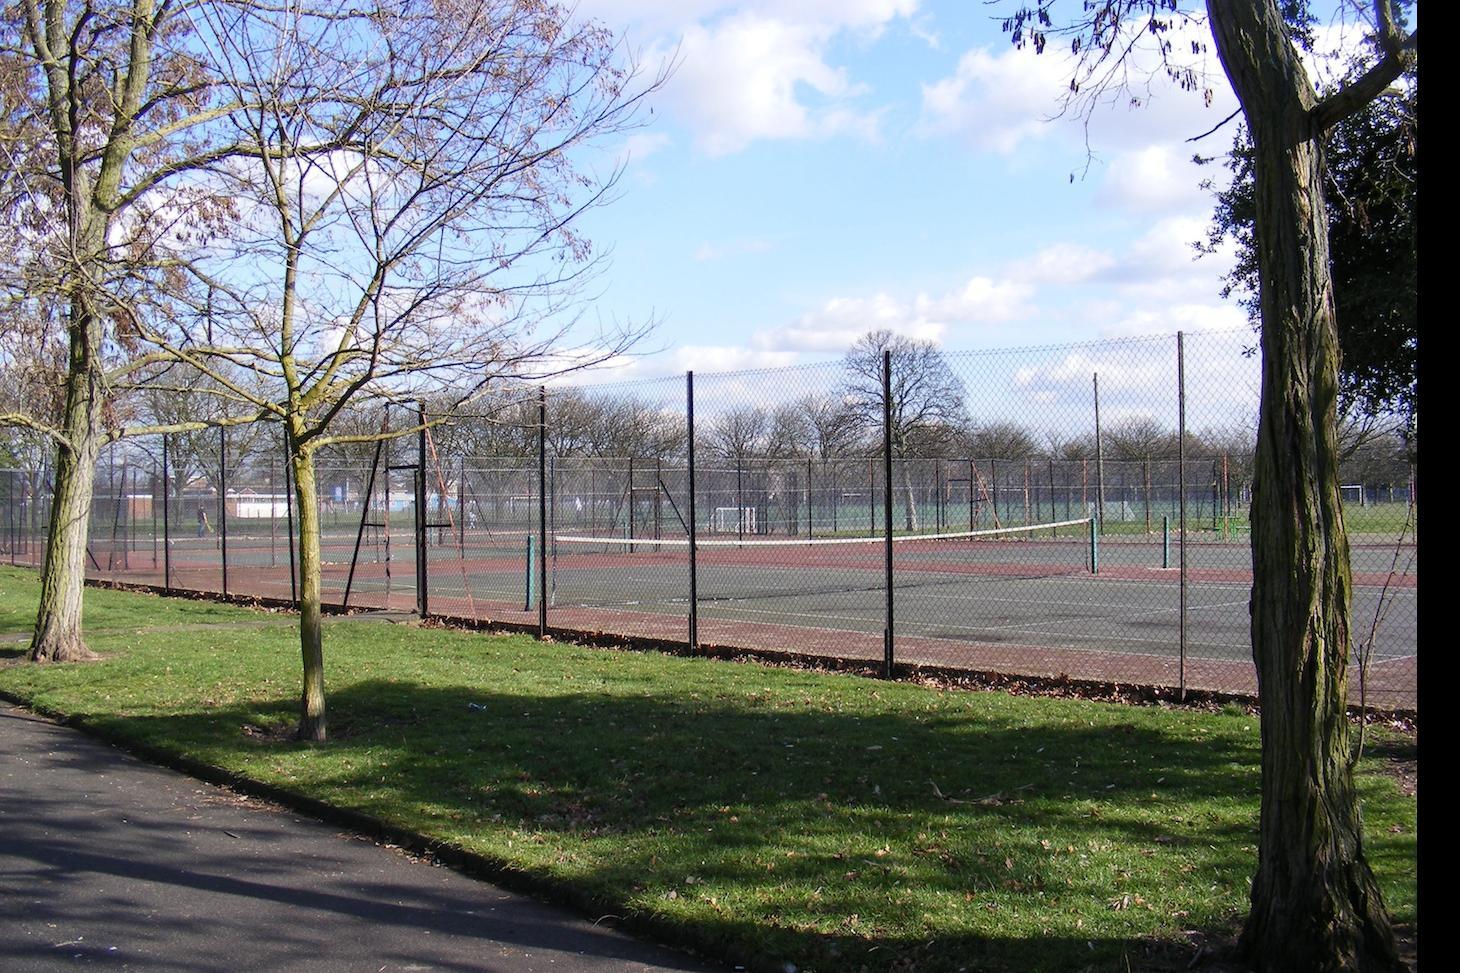 Barking Park Outdoor | Hard (macadam) tennis court